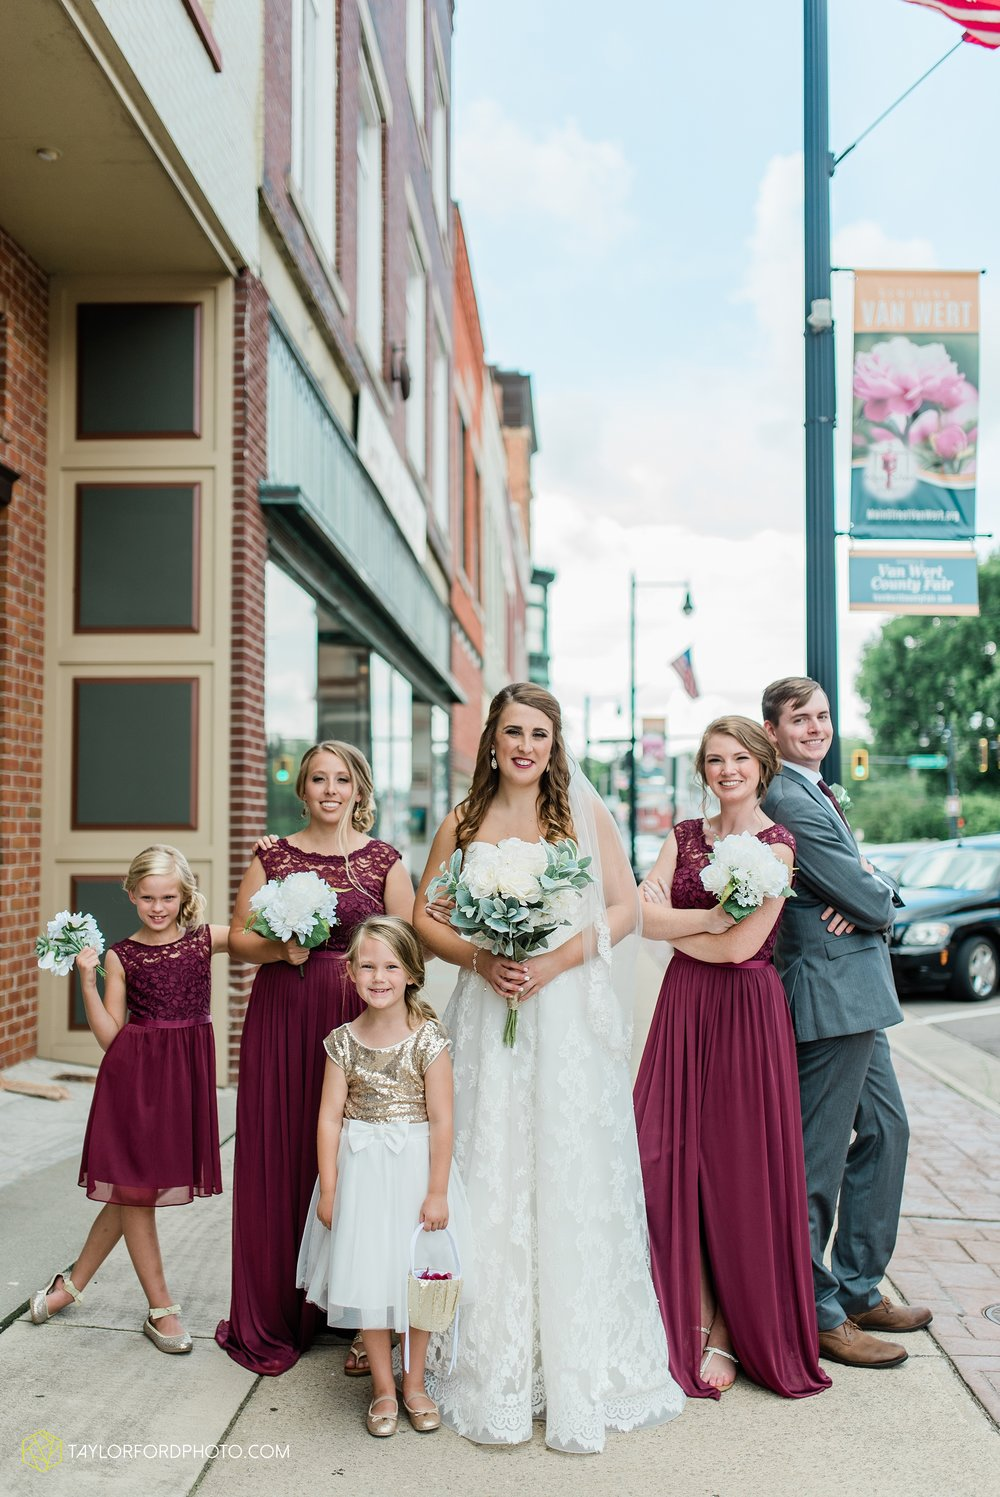 chelsey-zosh-jackson-young-first-united-methodist-church-senior-center-van-wert-ohio-wedding-photographer-taylor-ford-photography_0057.jpg